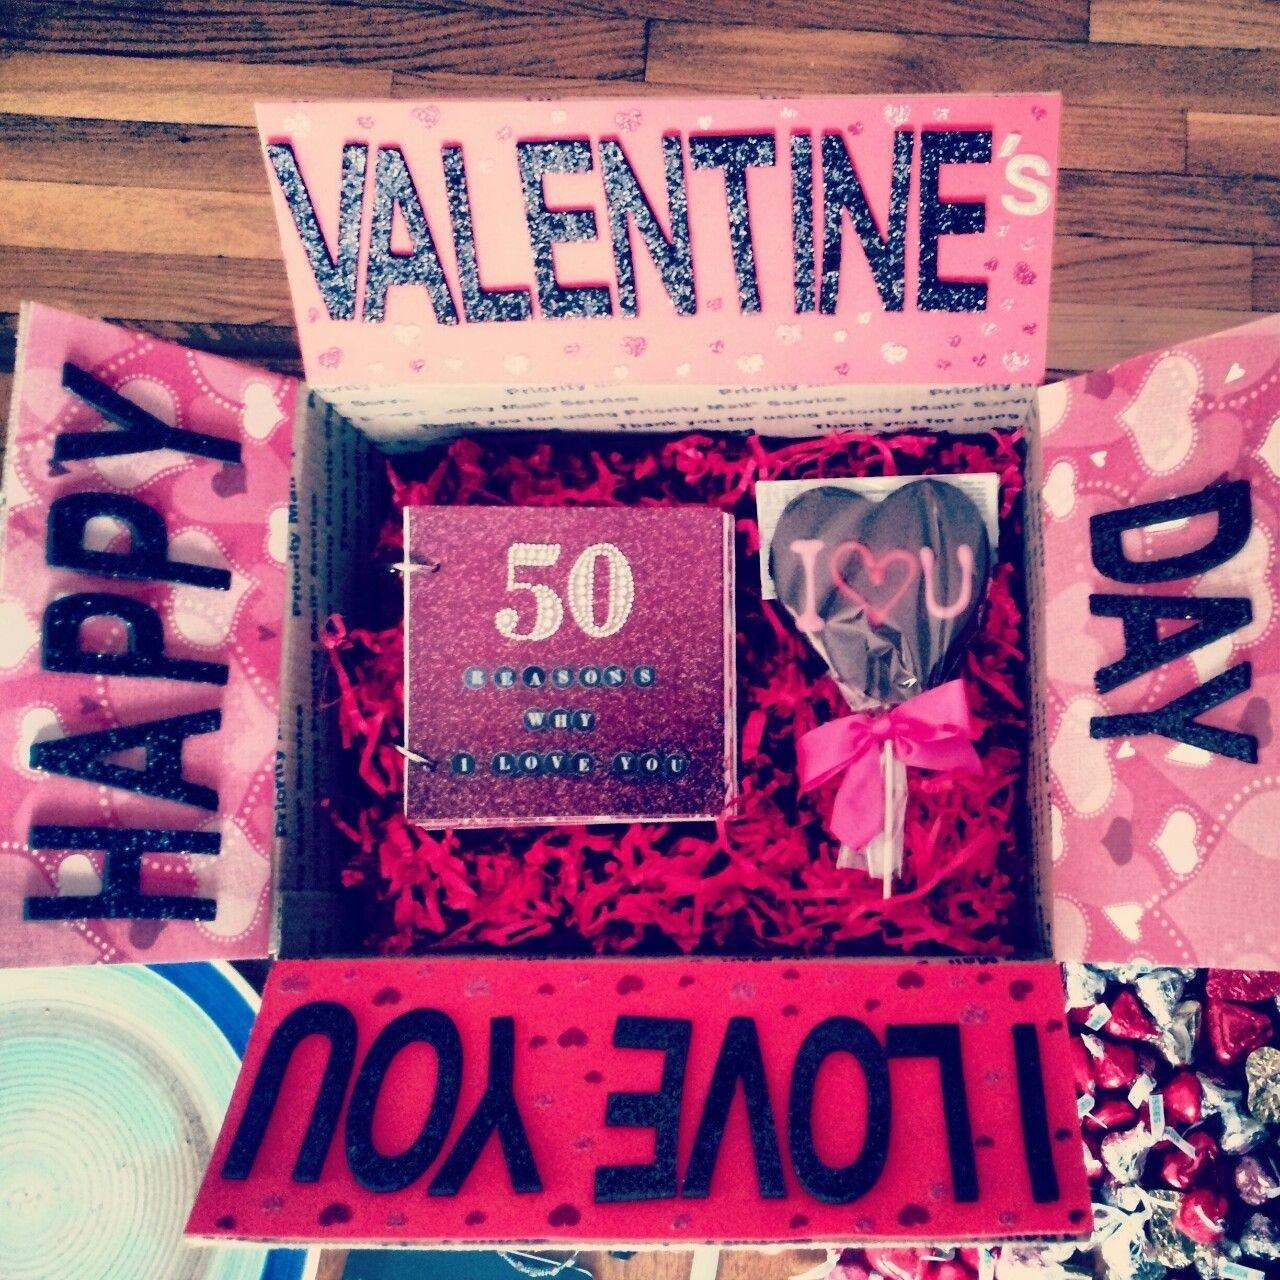 10 Cute Ideas For Boyfriend Valentines Day caixa de presente ideias bonitas pinterest doors box and gift 8 2020